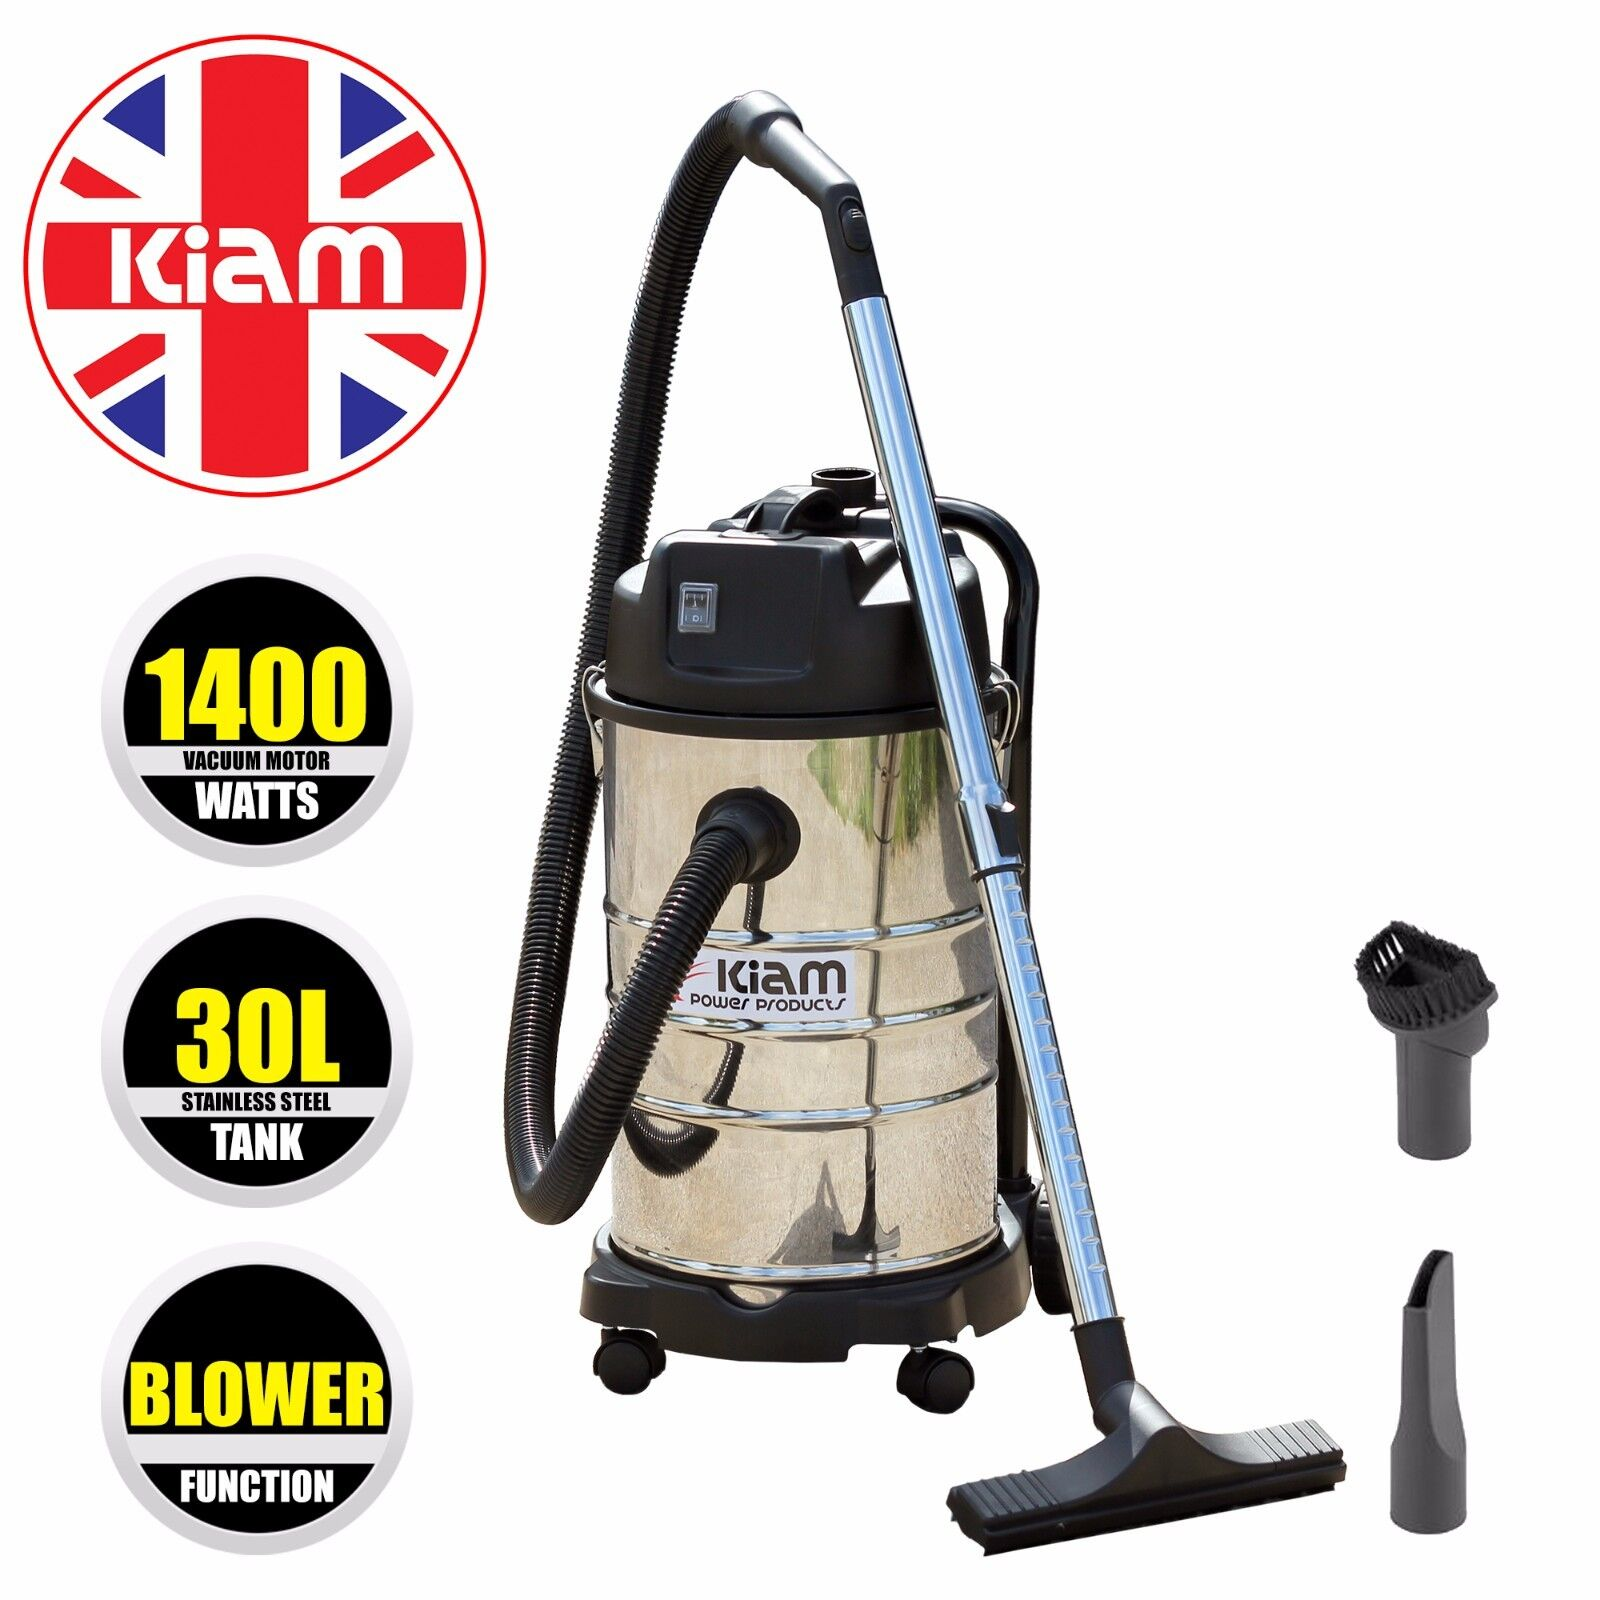 30 litre wet & dry aspirateur avec souffleur 1400 watts en acier inoxydable cylindre